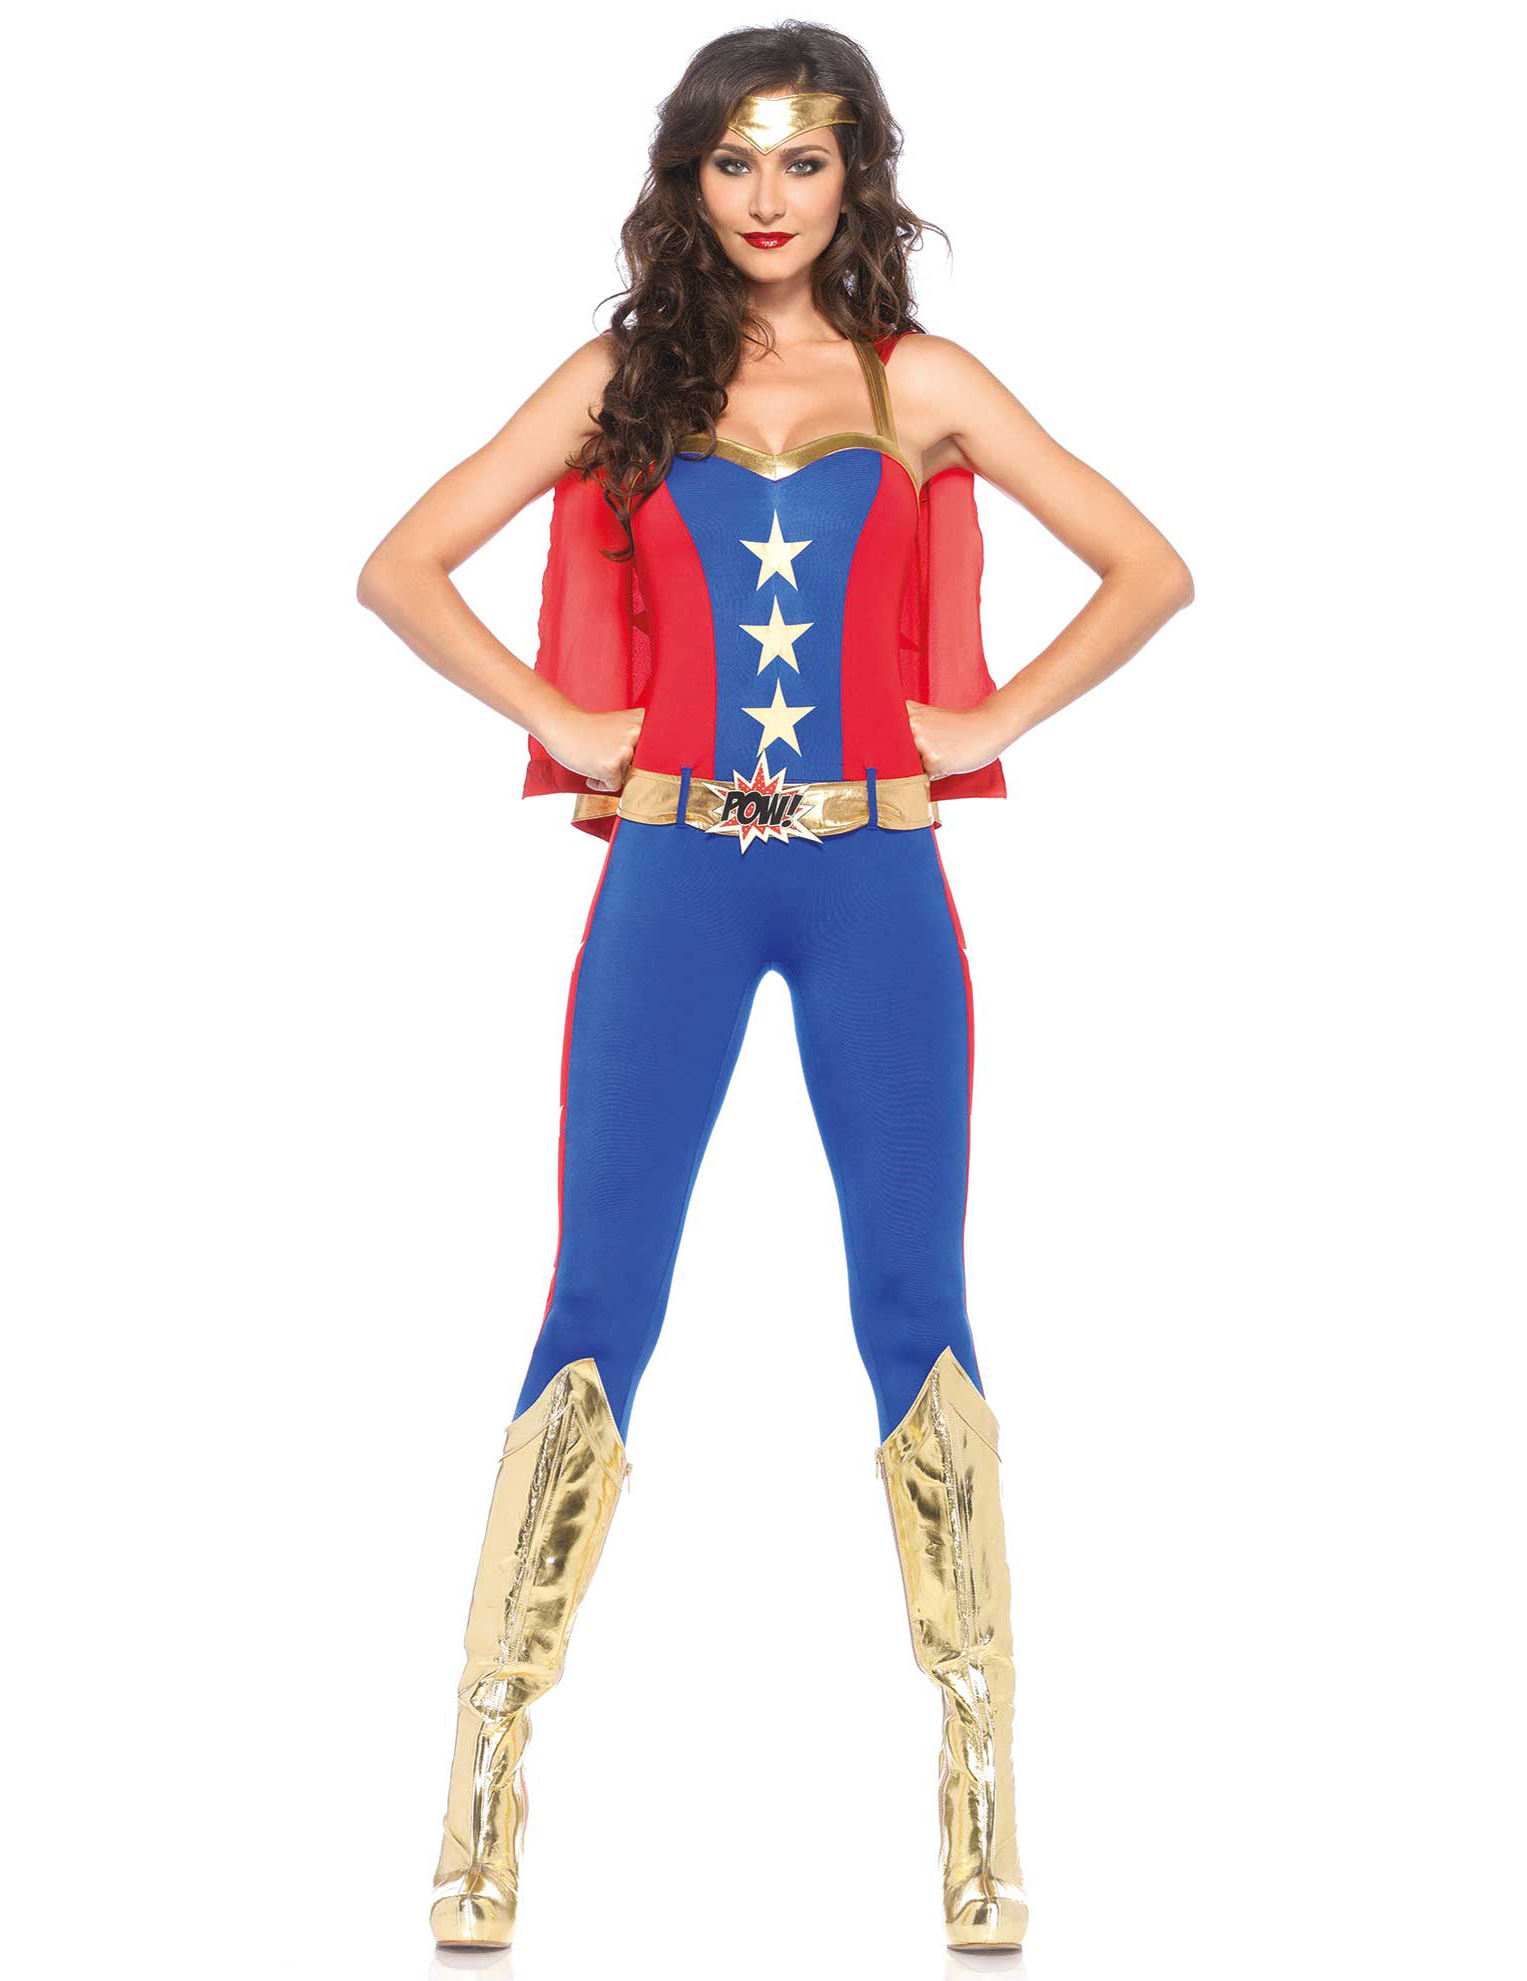 deguisement adulte femme super heros